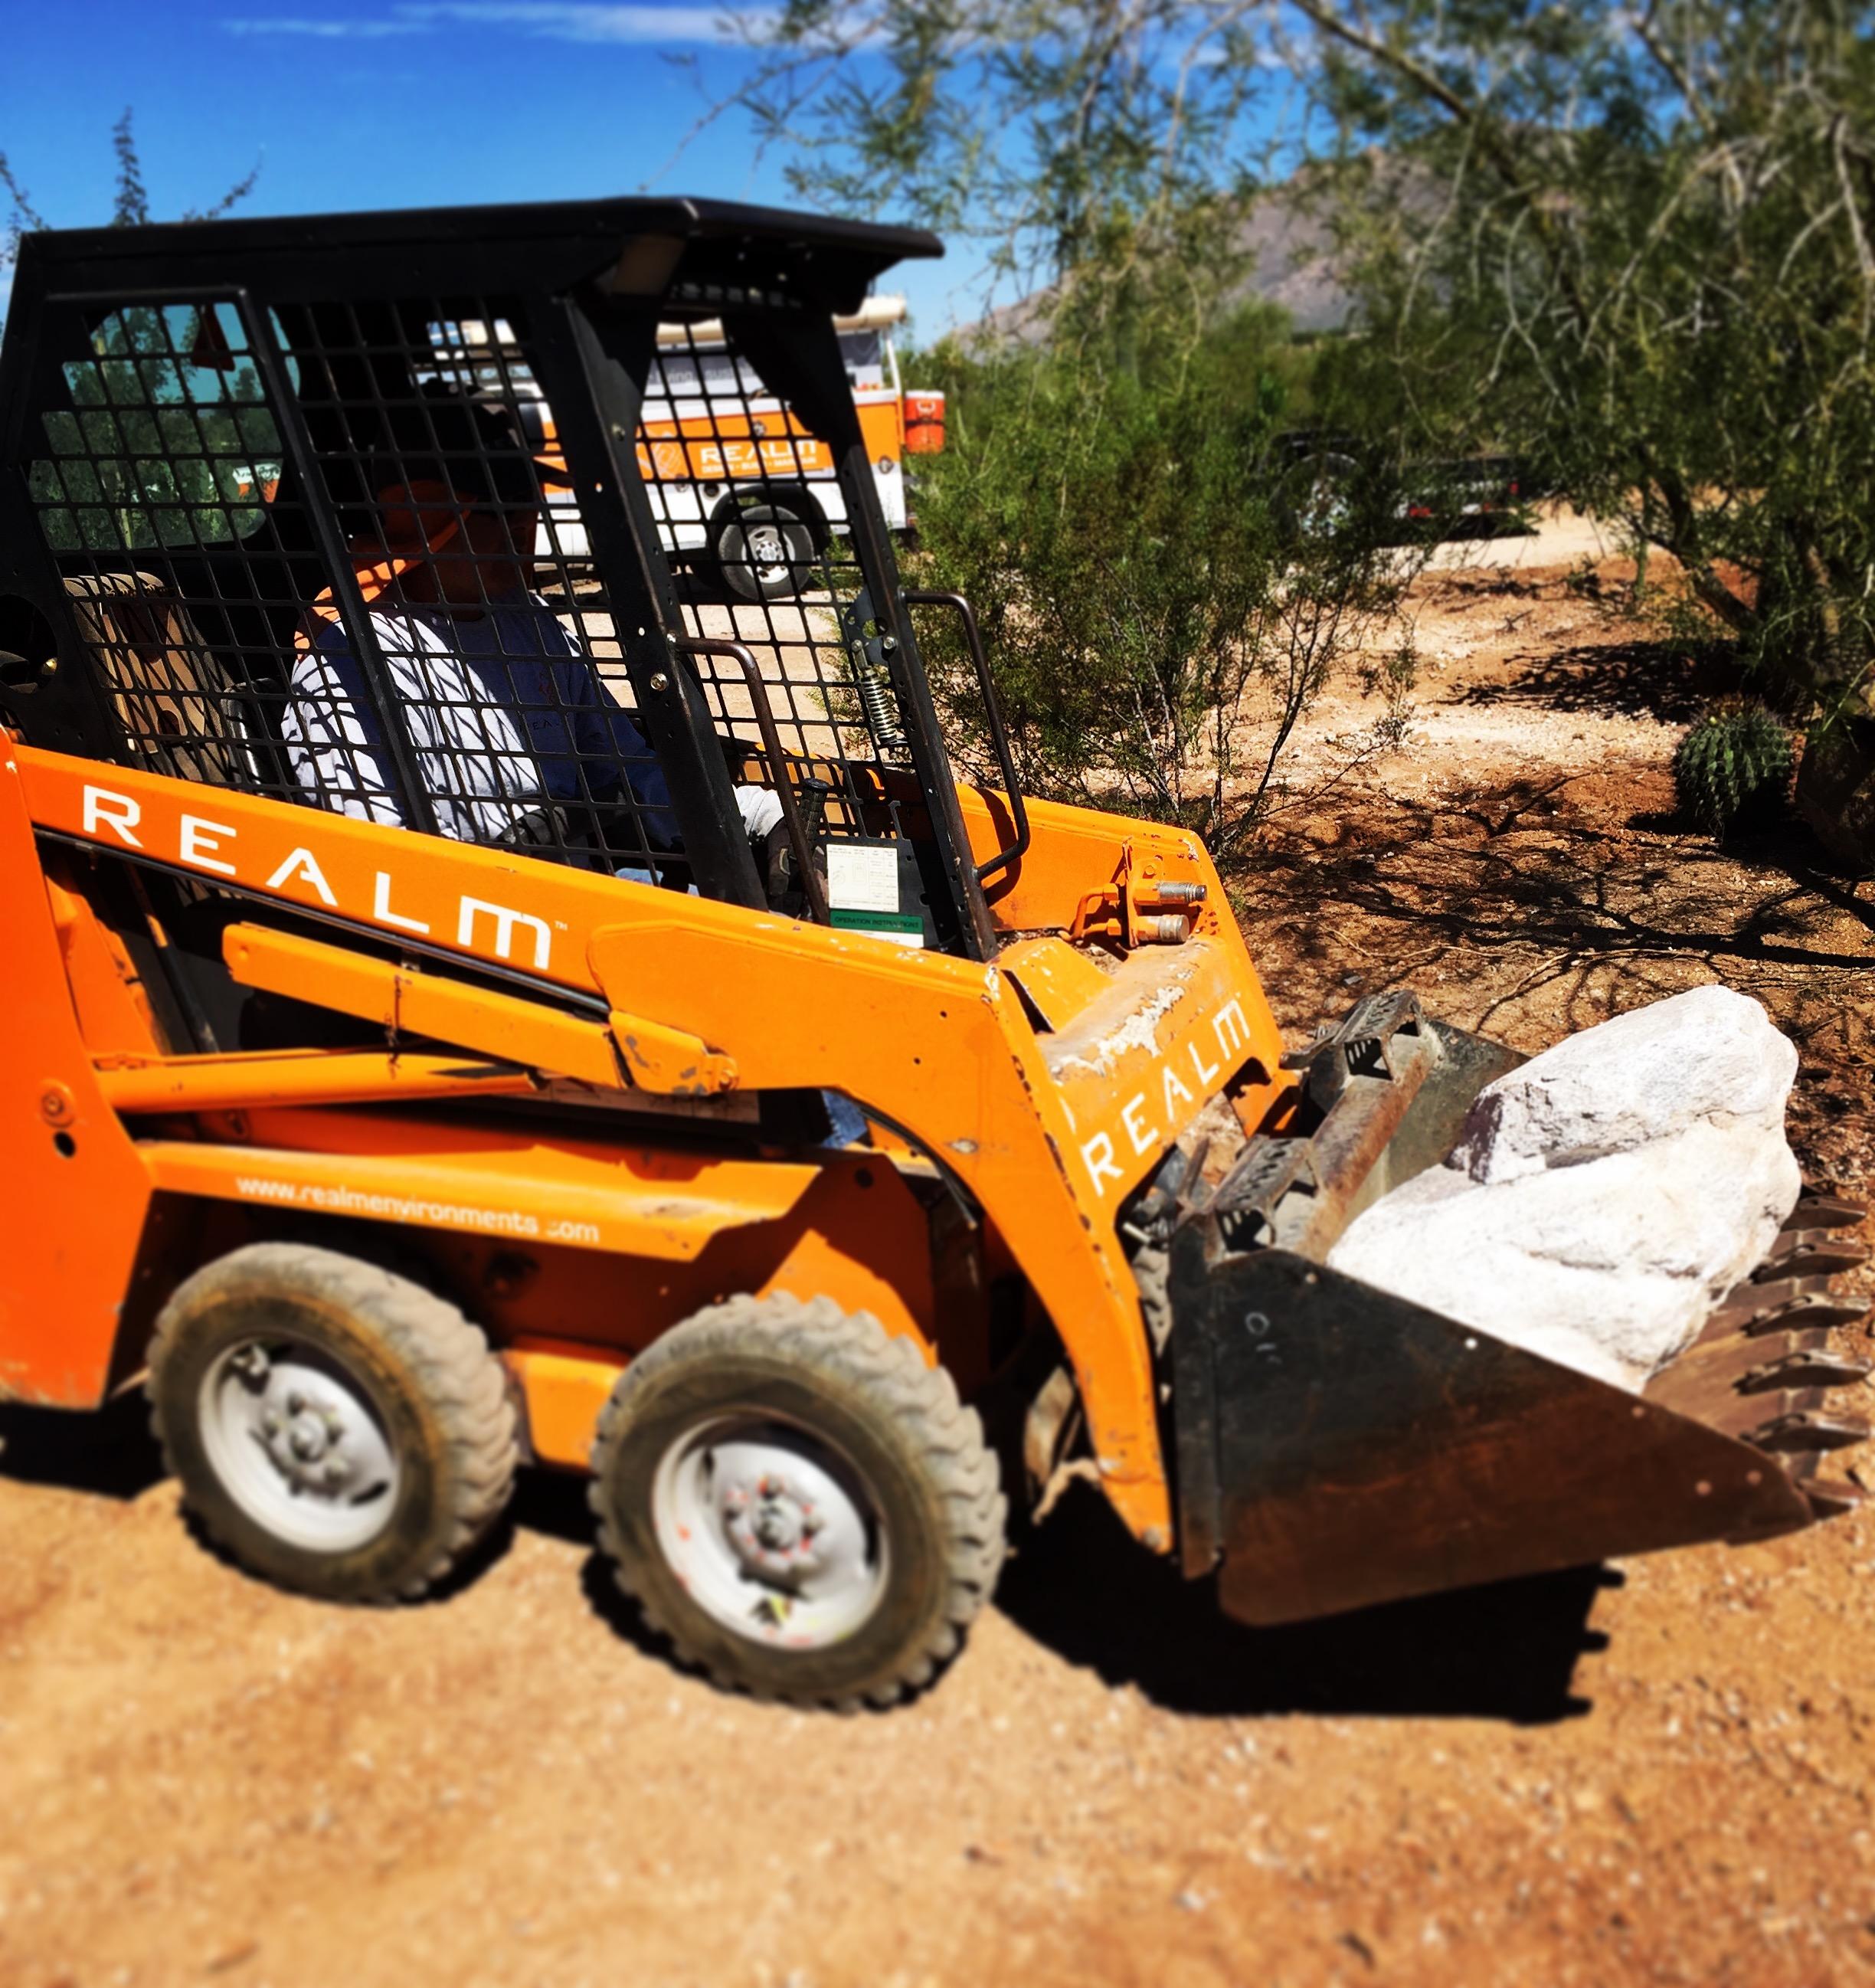 Native boulder relocation and rainwater harvesting gradework